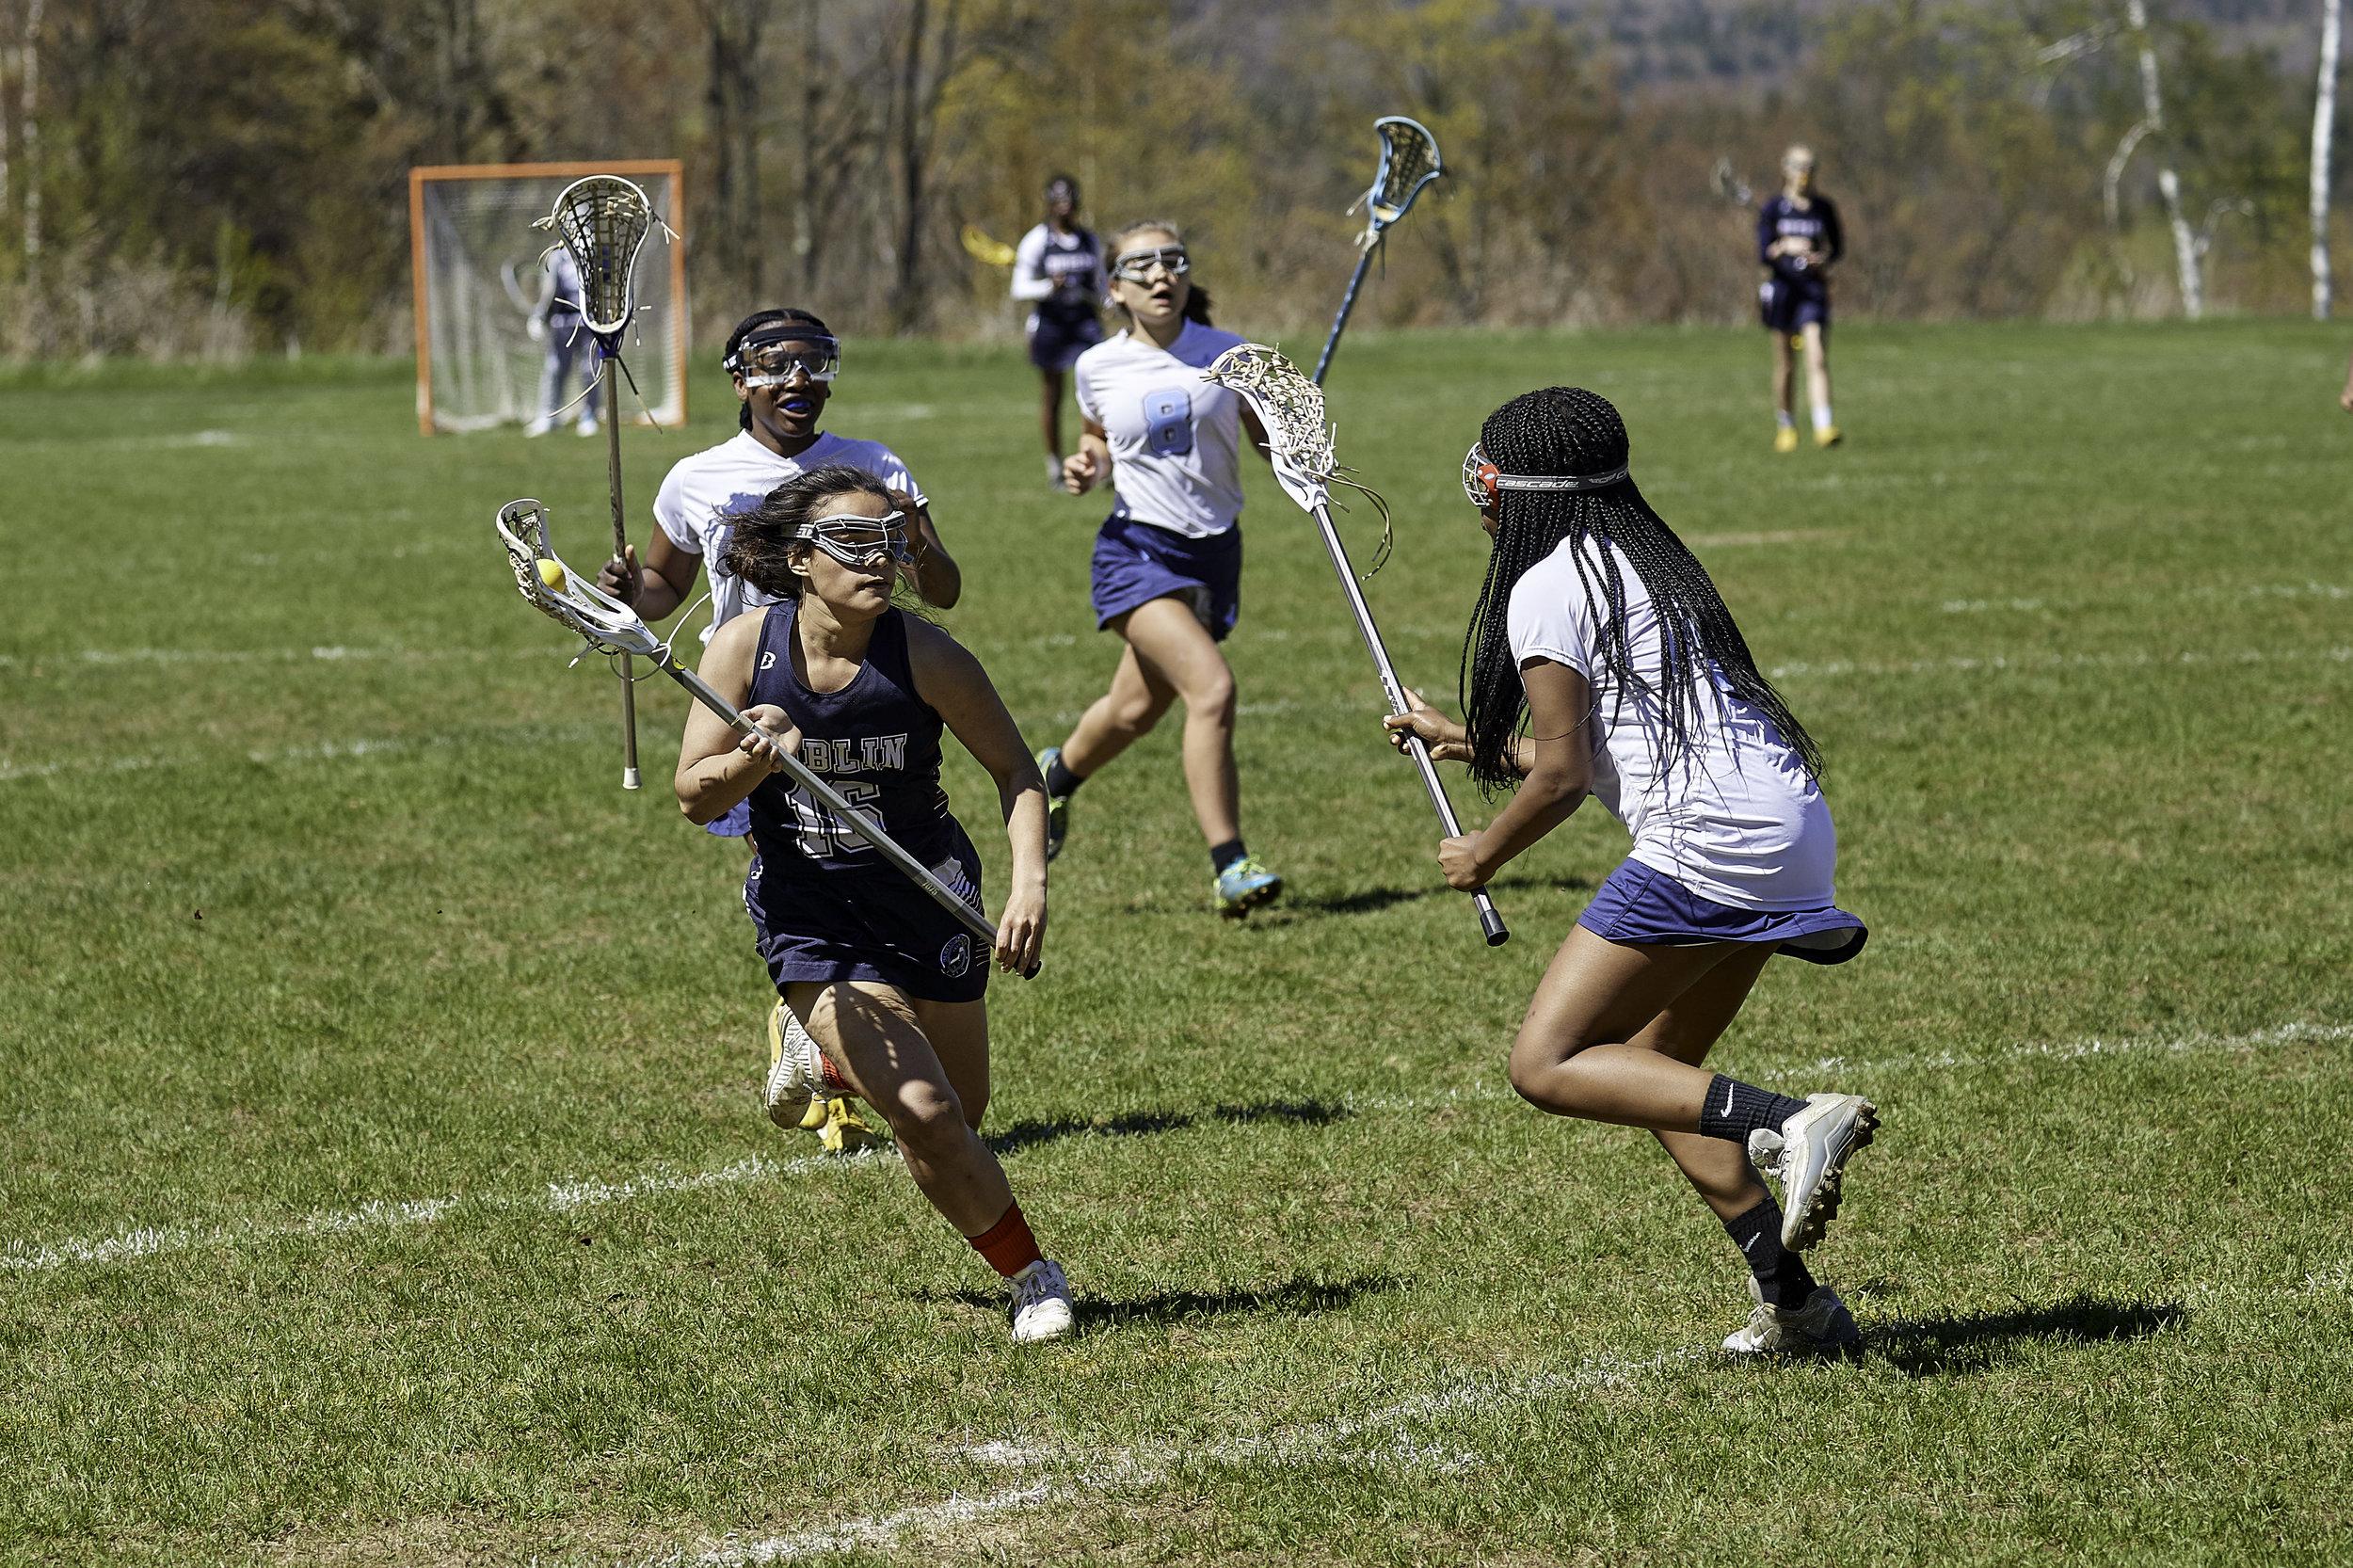 Girls Lacrosse vs. Stoneleigh Burnham School - May 11, 2019 - May 10, 2019193316.jpg